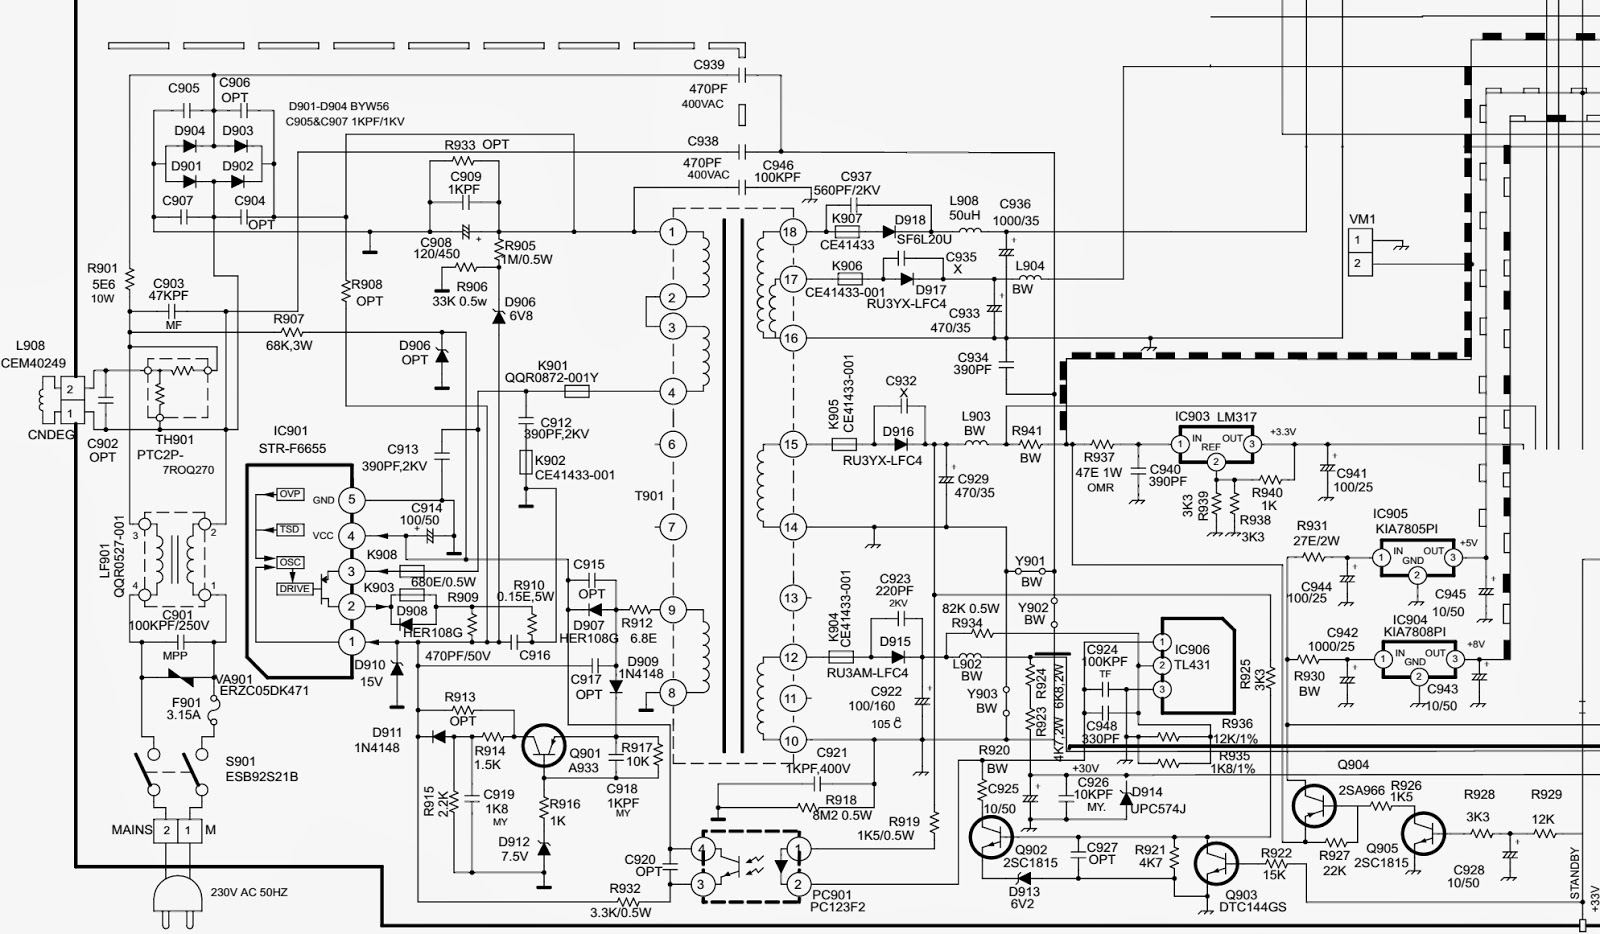 Samsung Plasma Tv Wiring Diagram Get Free Image About Control Panel Download Schematic Aiwa Circuit Simple Schema